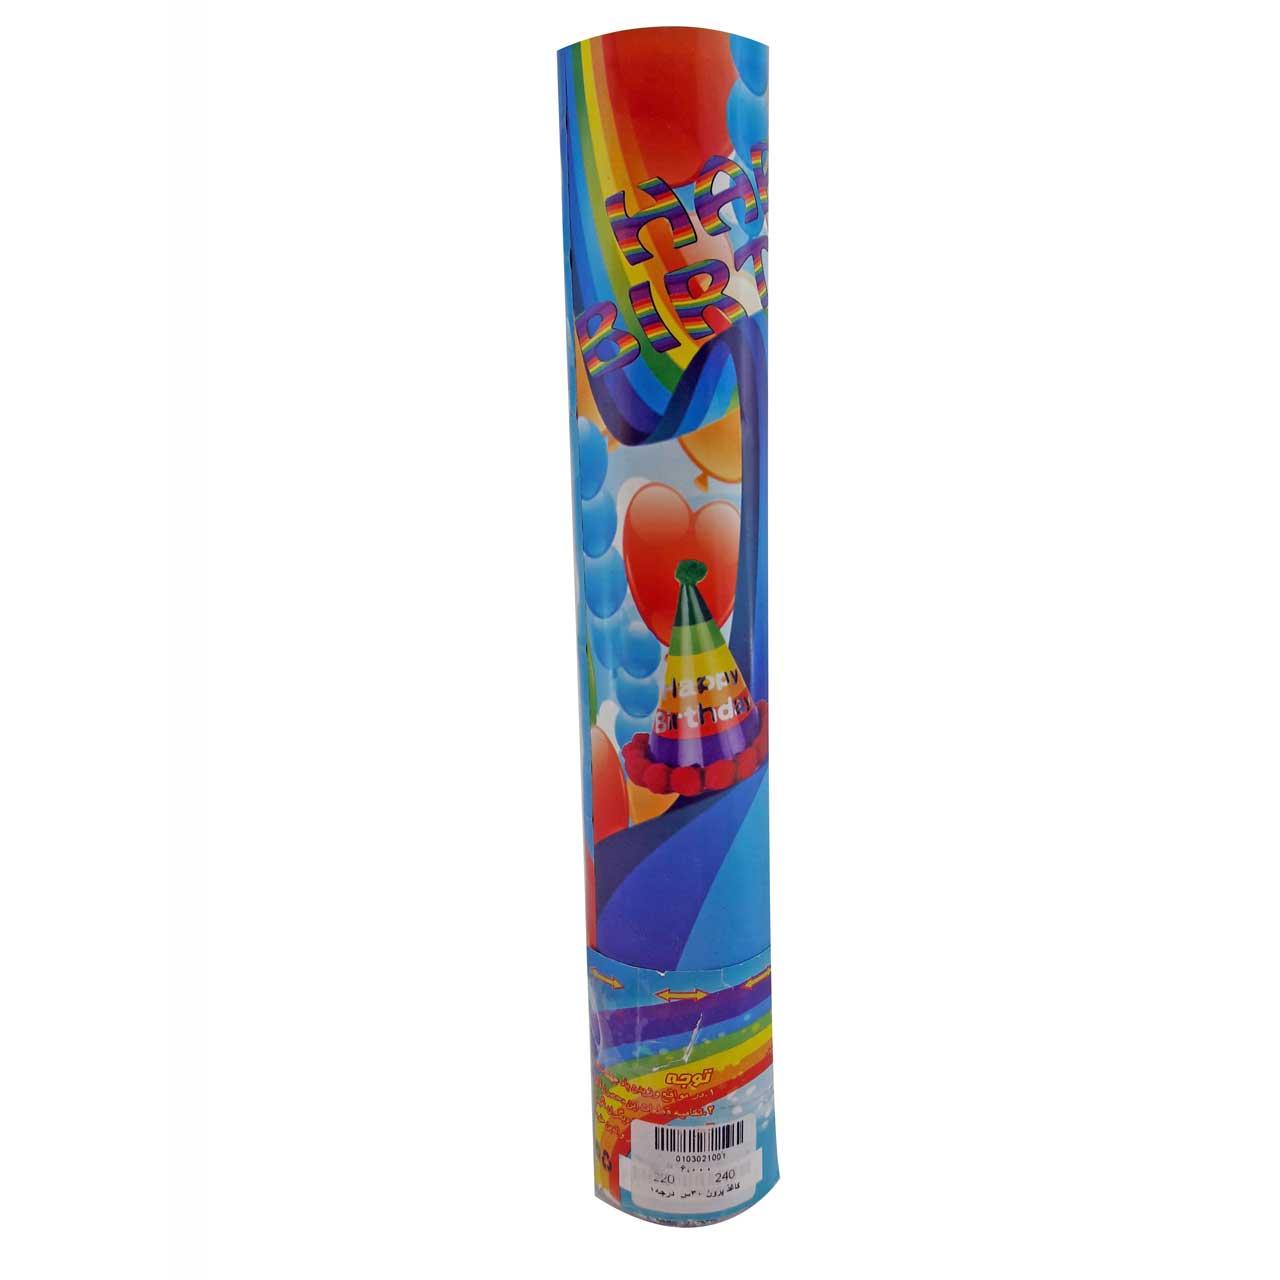 بمب شادی طرح رنگین کمان سایز 120